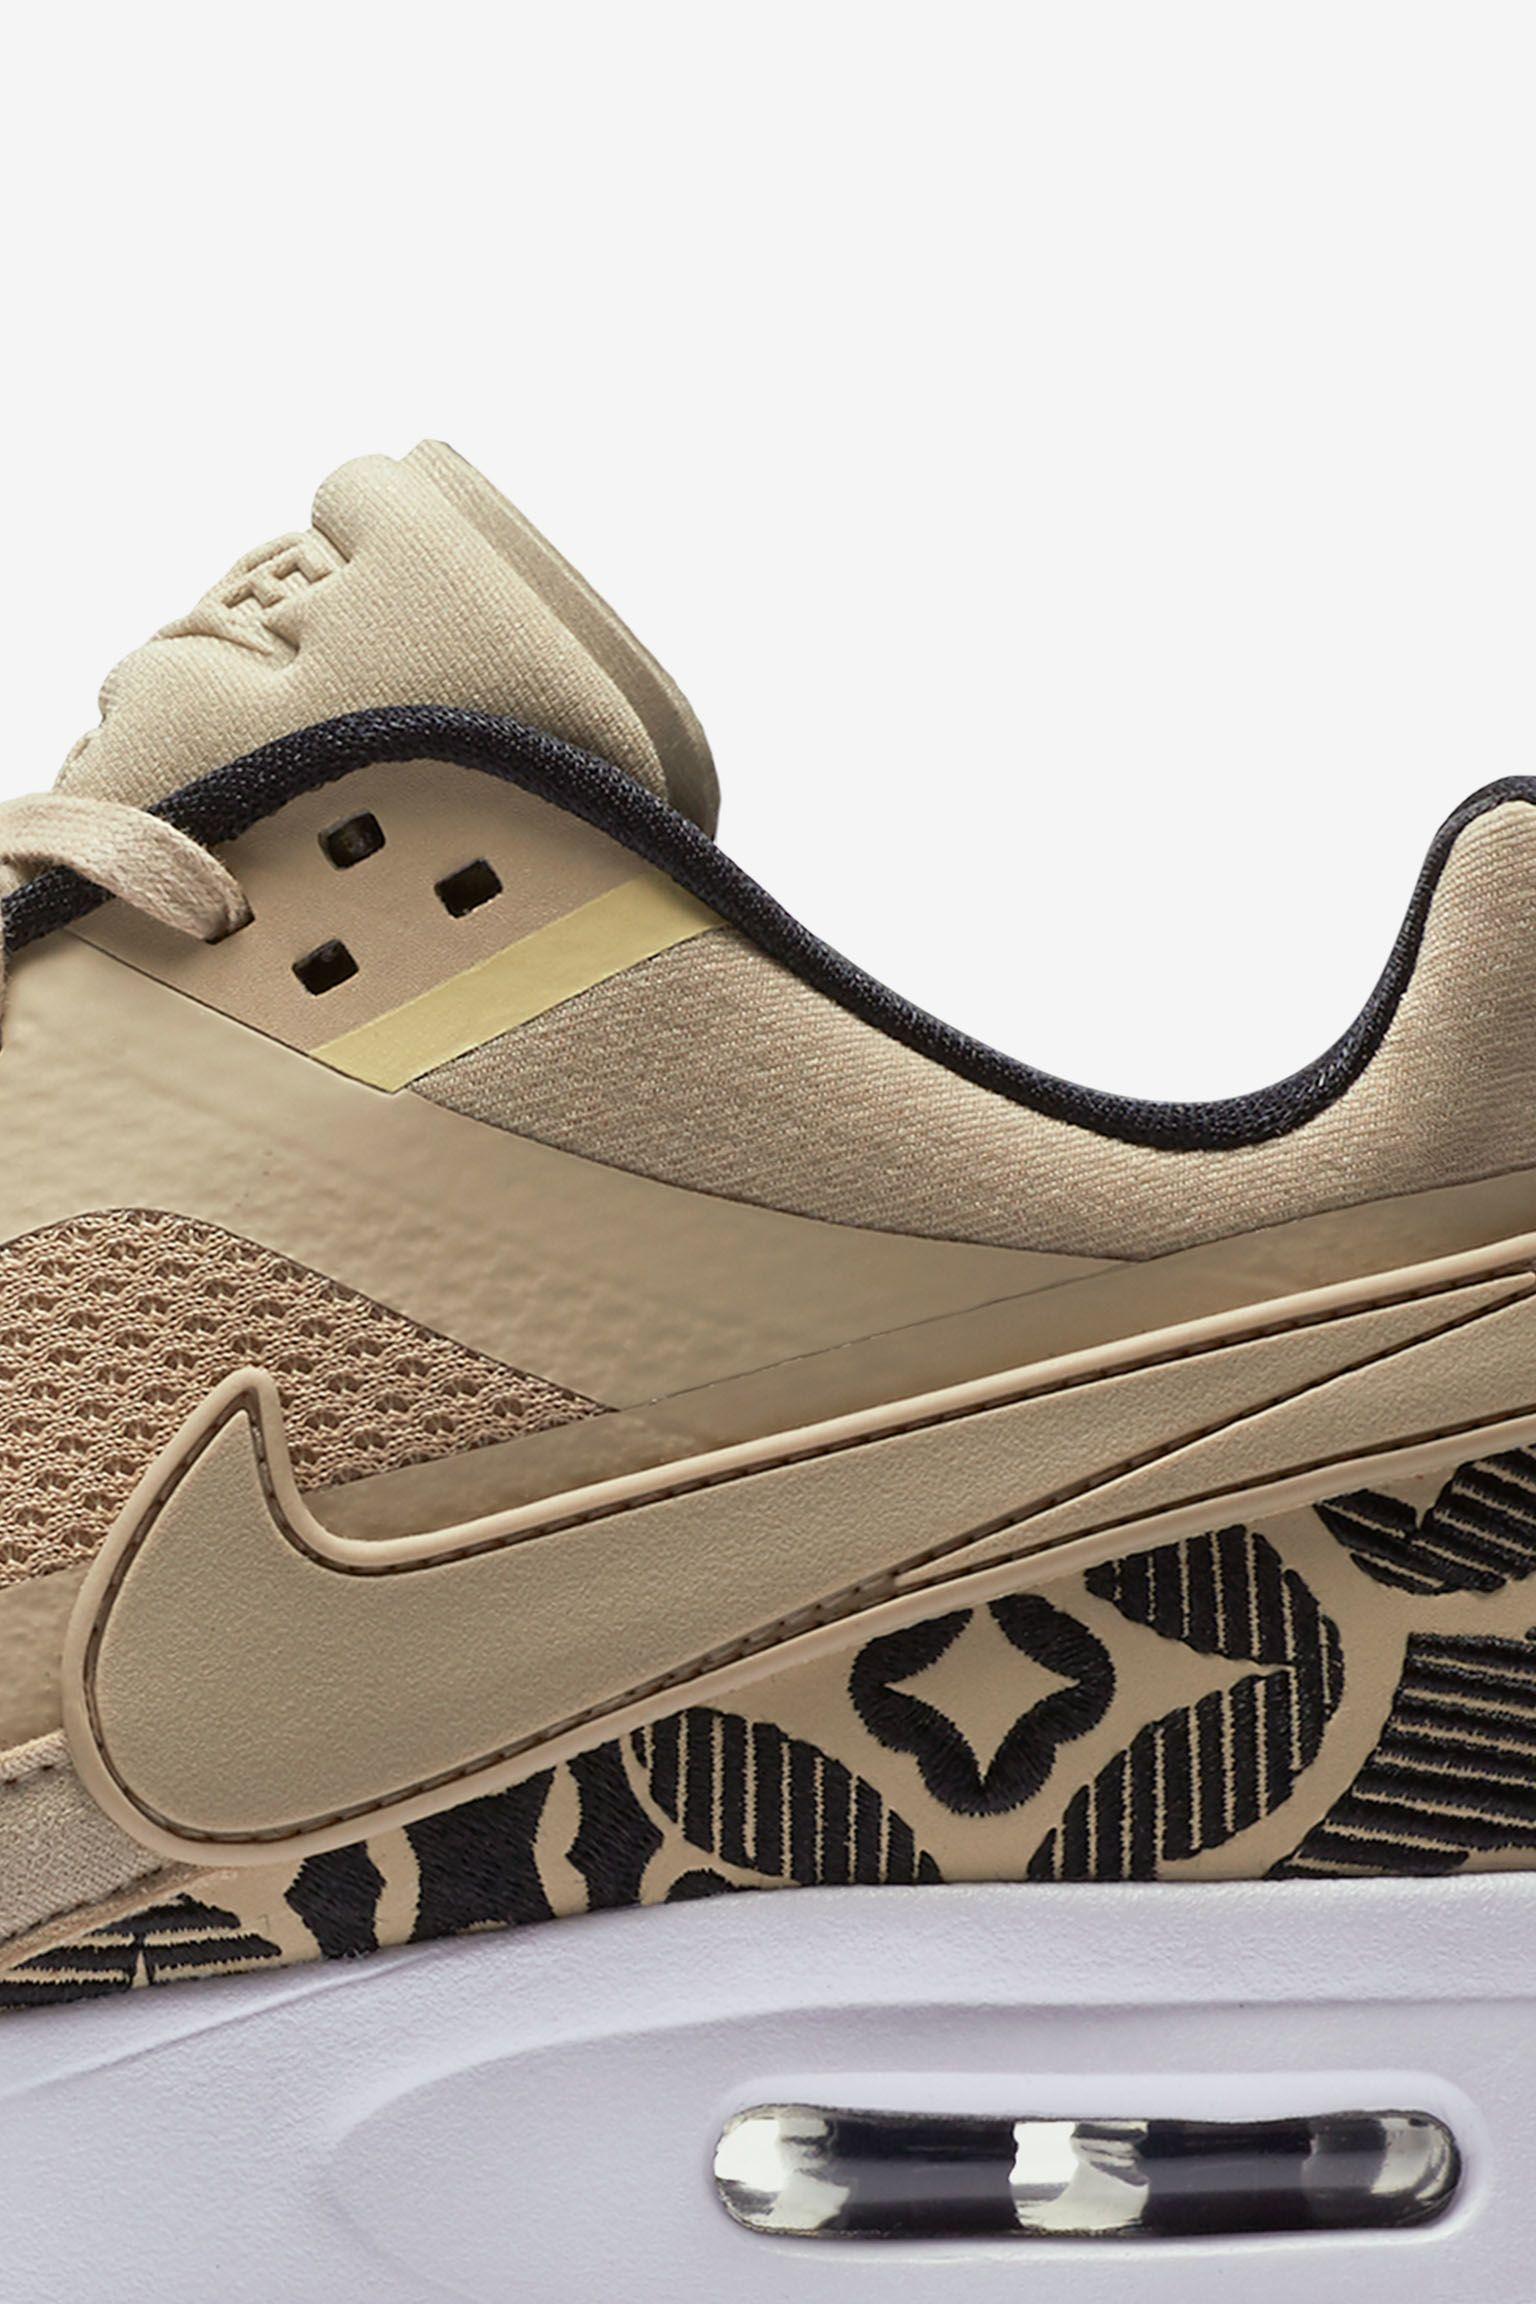 Women's Nike Air Max BW Ultra 'London' Release Date